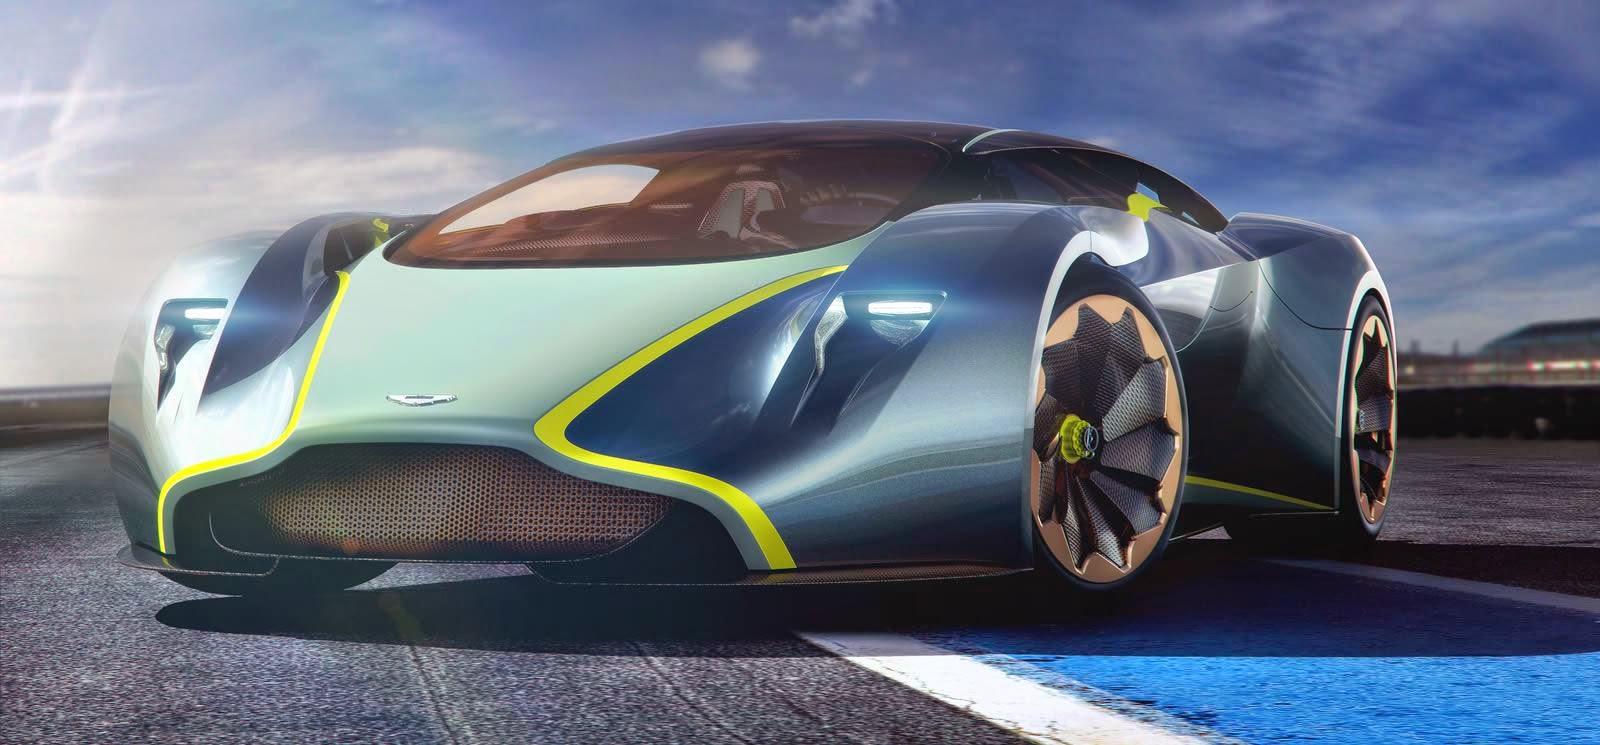 [Resim: Aston+Martin+DP-100+Vision+Gran+Turismo+1.jpg]